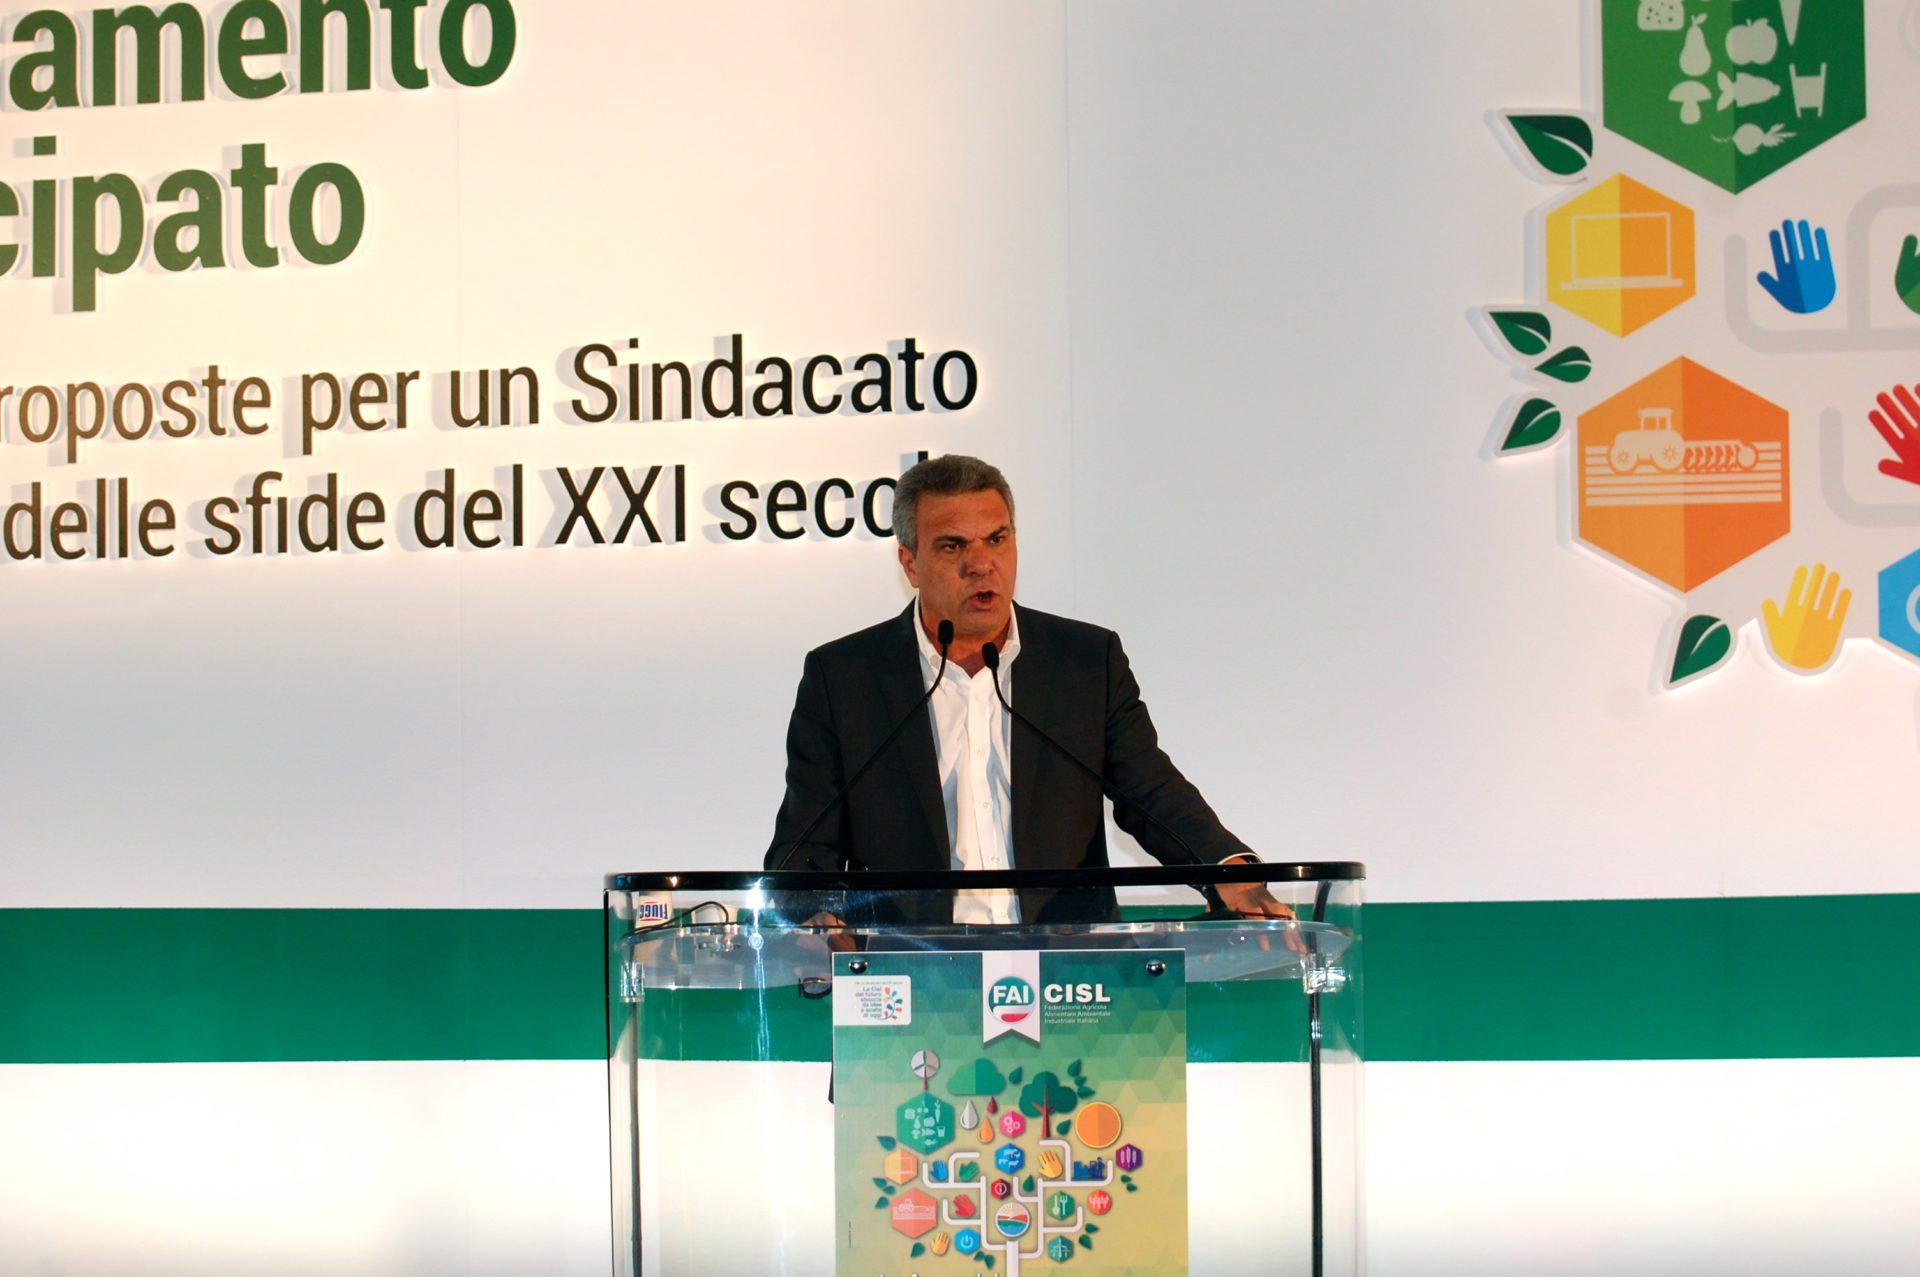 Sbarra nuovo segretario generale aggiunto Cisl al congresso